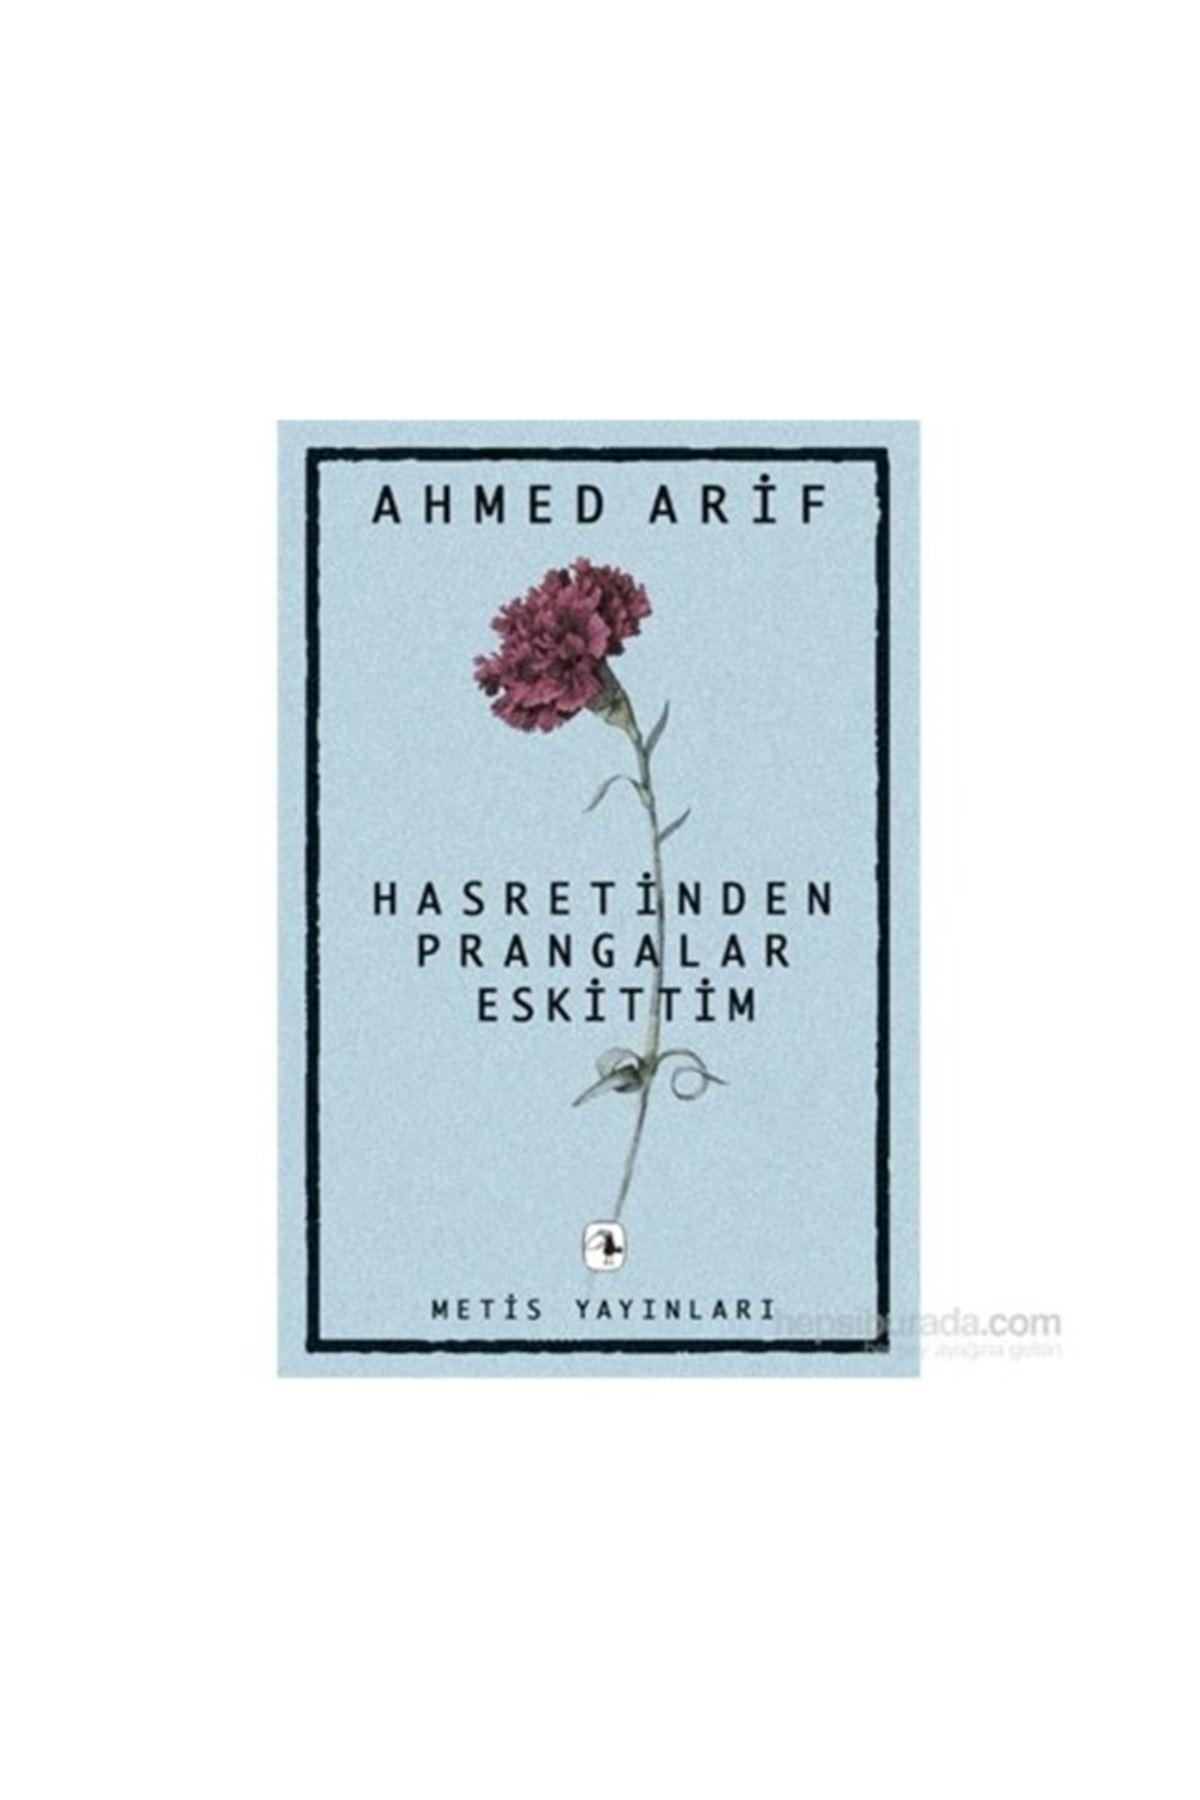 AHMED ARİF- HASRETINDEN PRANGALAR ESKİTTİM